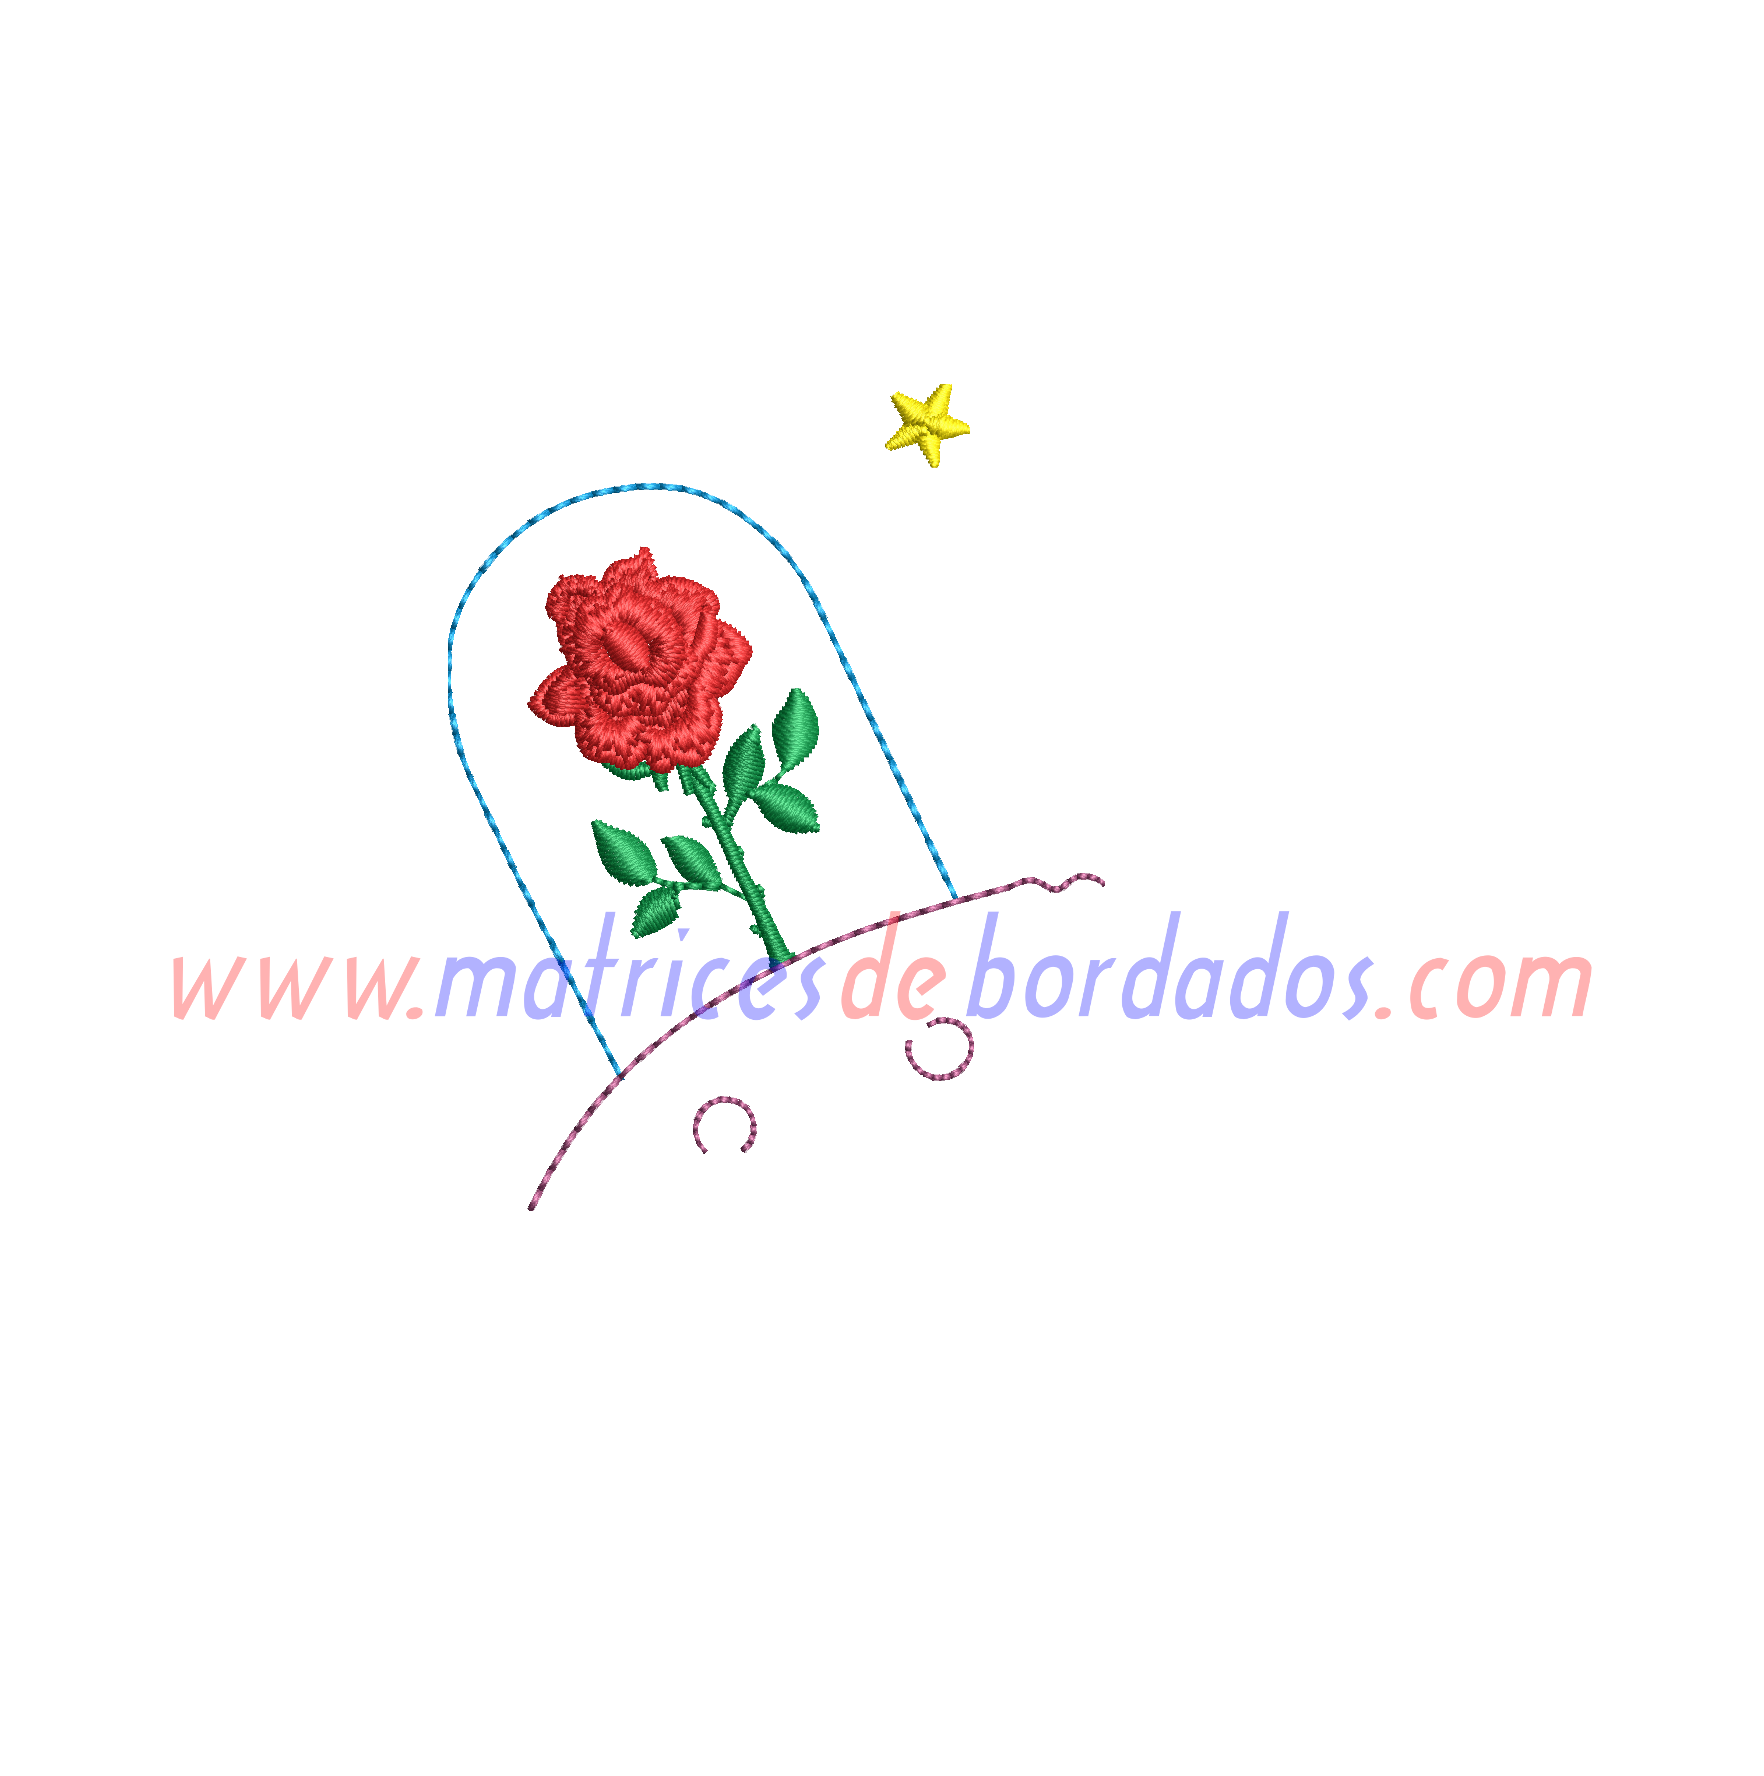 XK54UW - Rosa El Principito